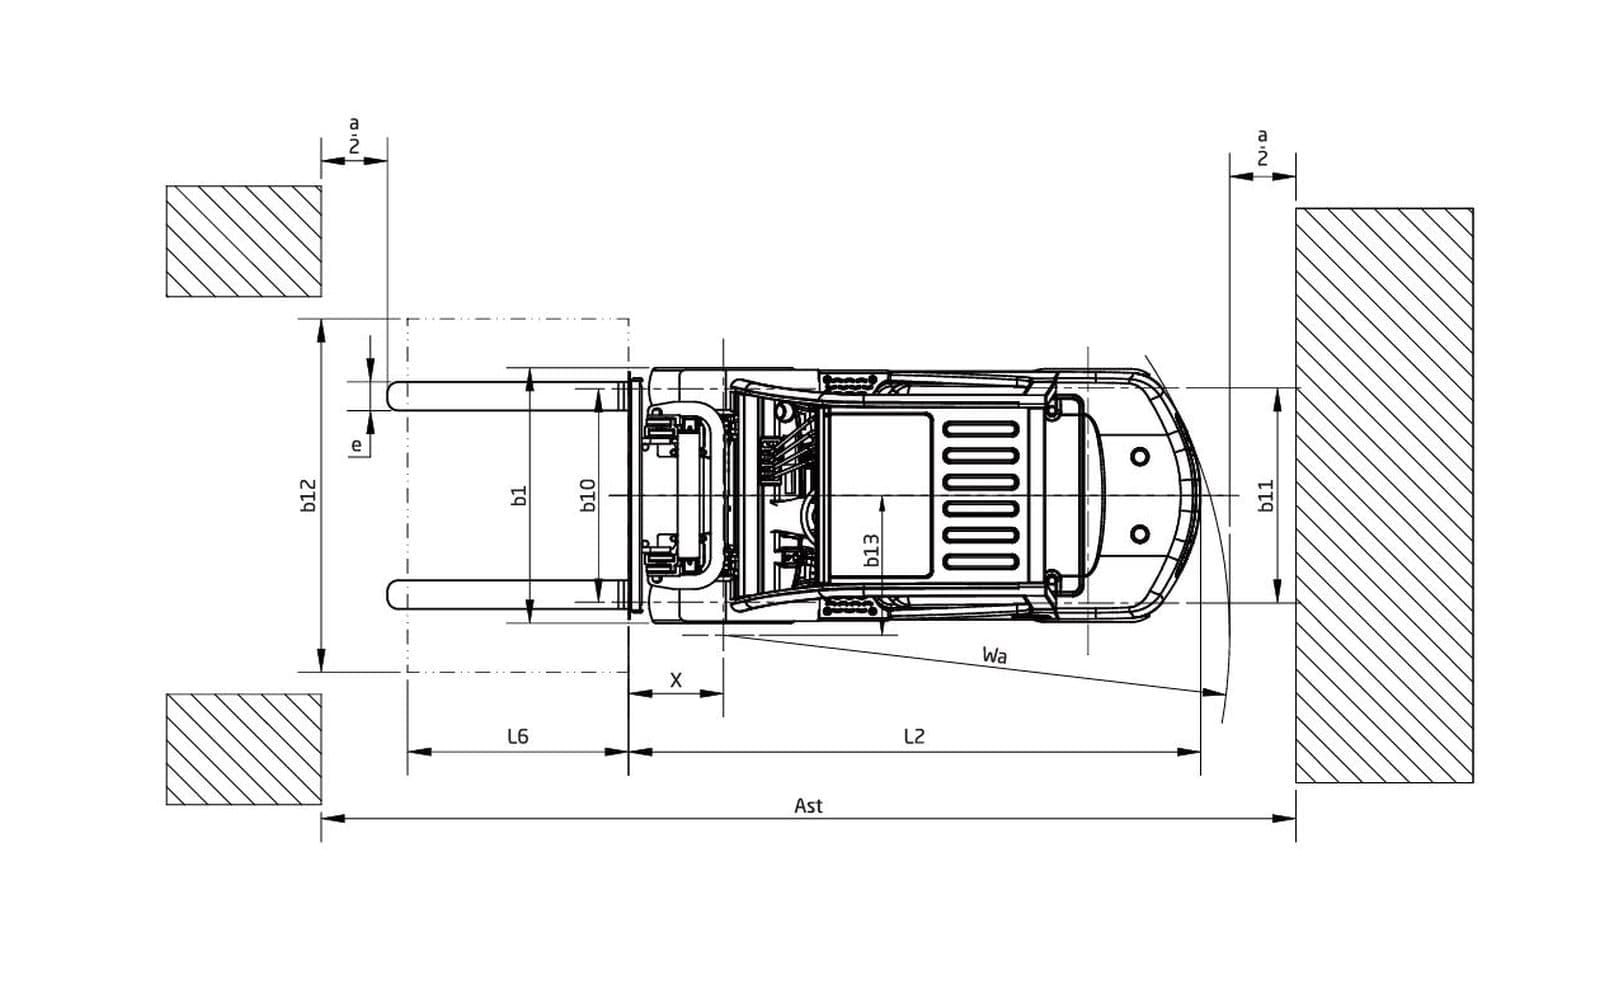 seria-xf-1.0-3.5-t-002